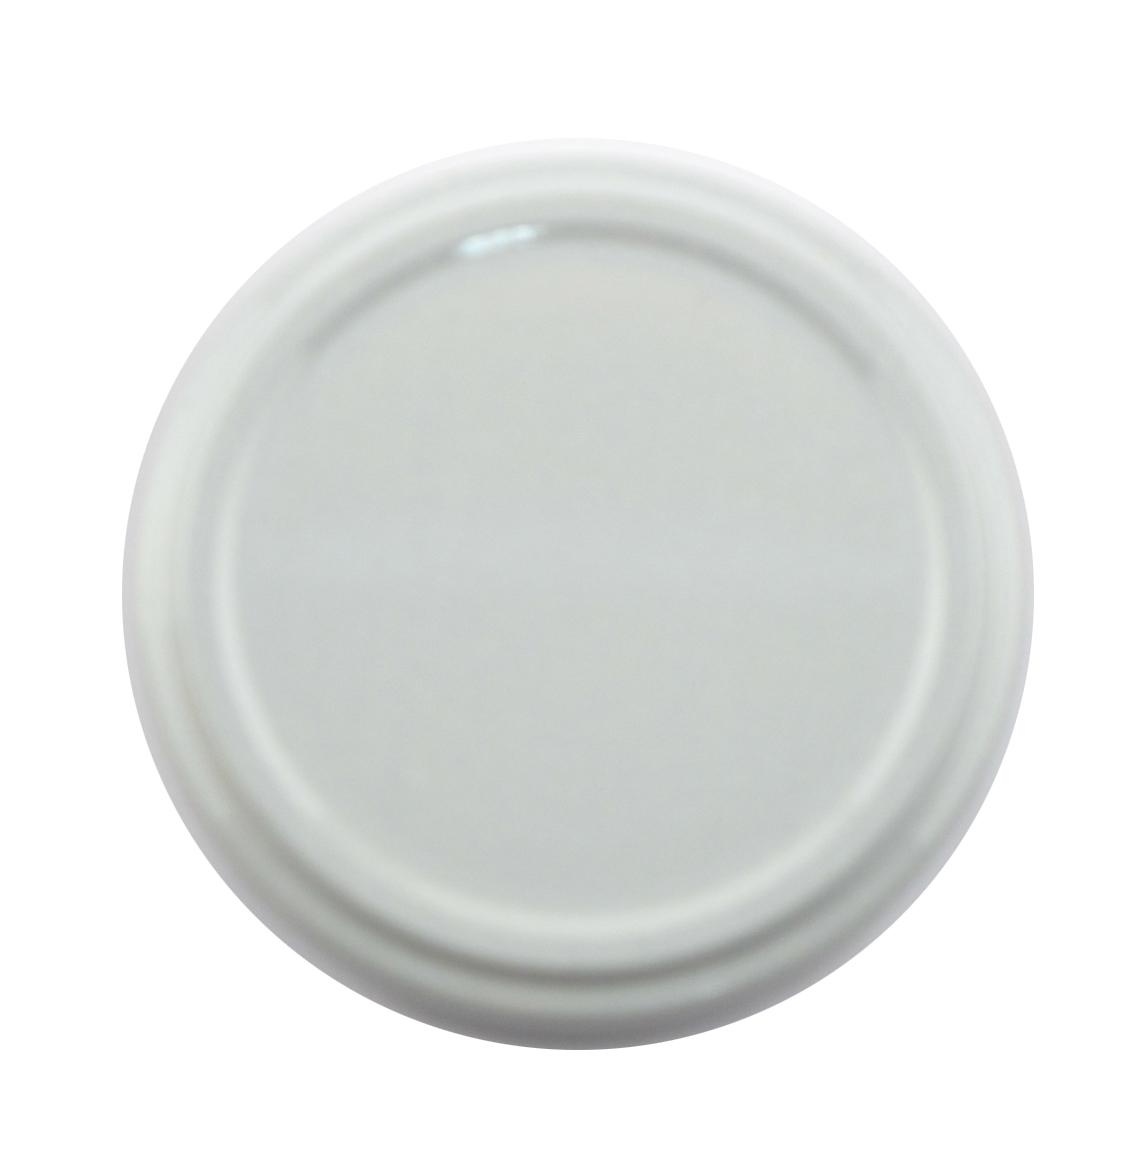 Honigglasdeckel Weiss 63 mm